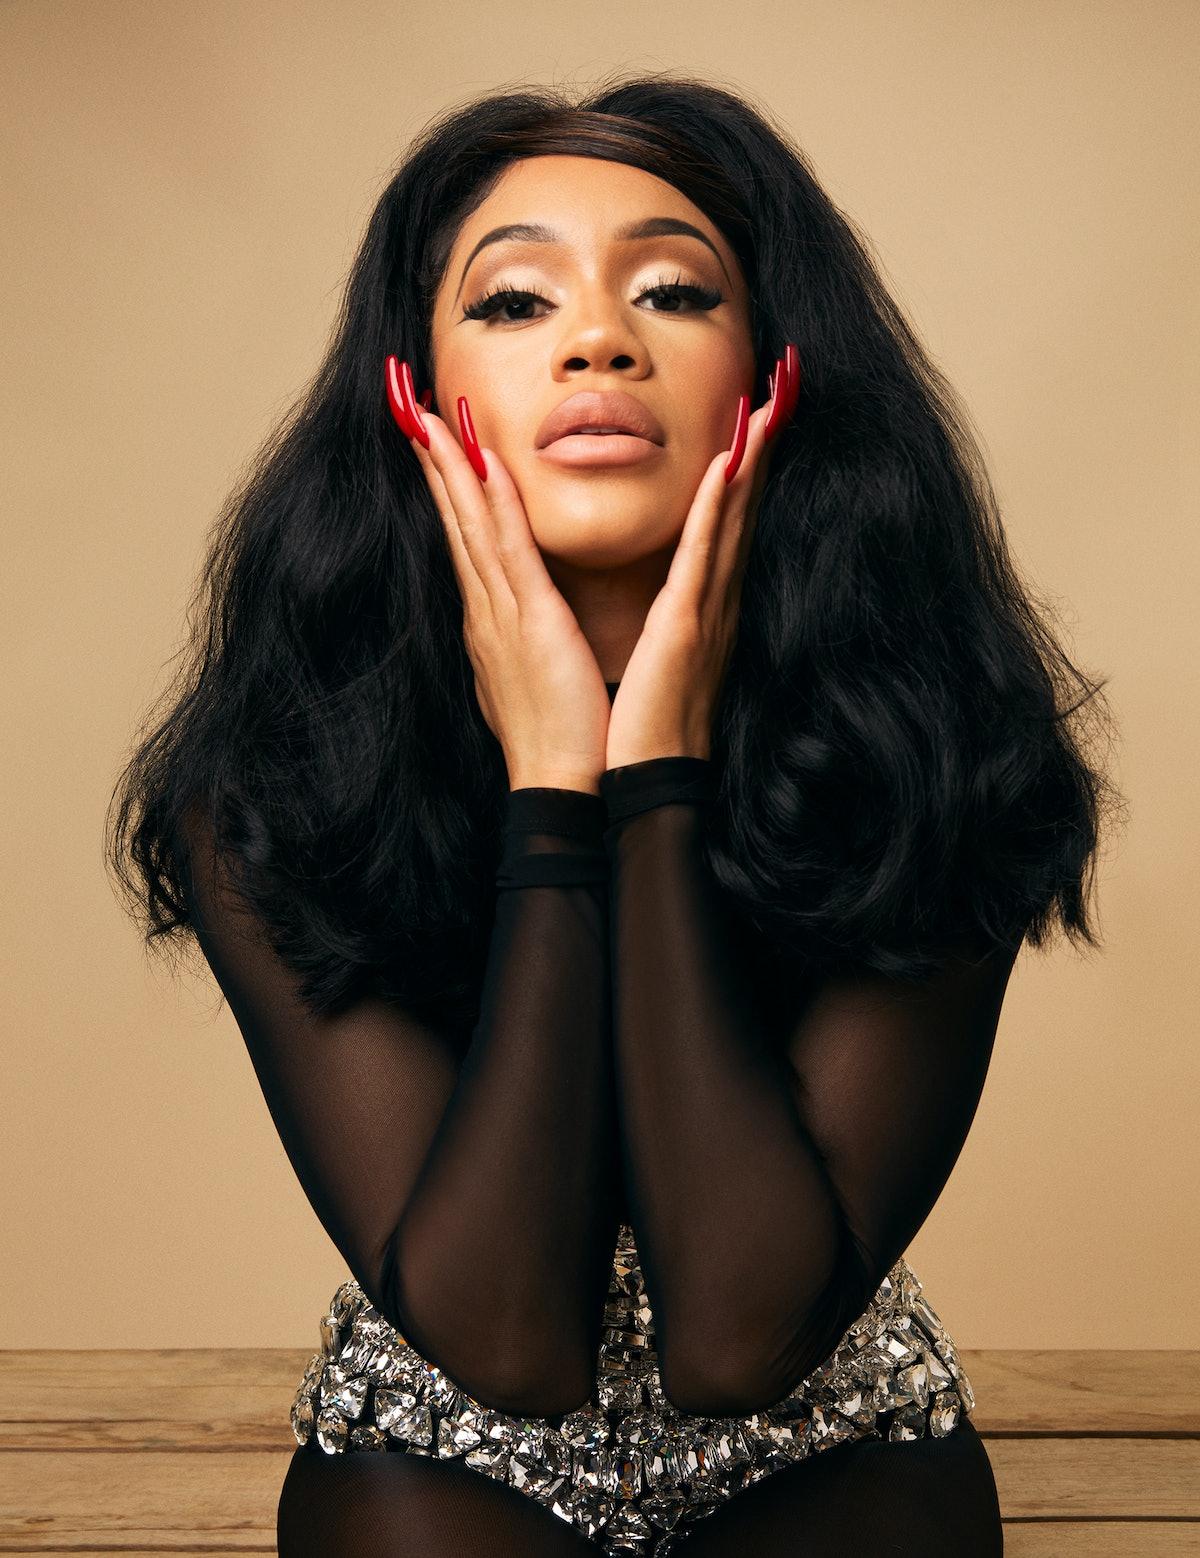 Saweetie wears a Dolce & Gabbana crystal bodysuit. Photographed by John Edmonds.